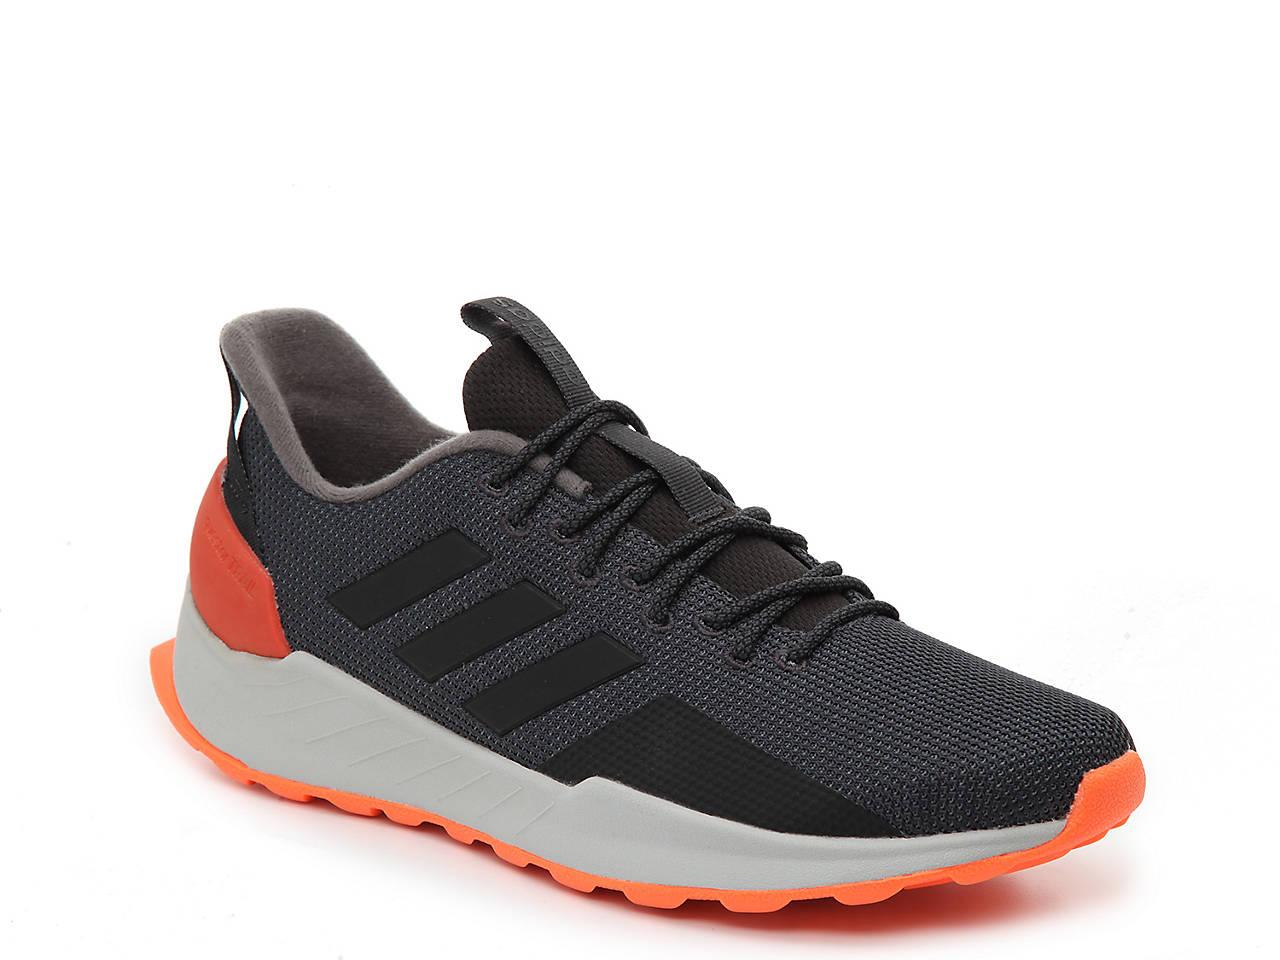 5f980f858c7 adidas Questar Trail Running Shoe - Men s Men s Shoes